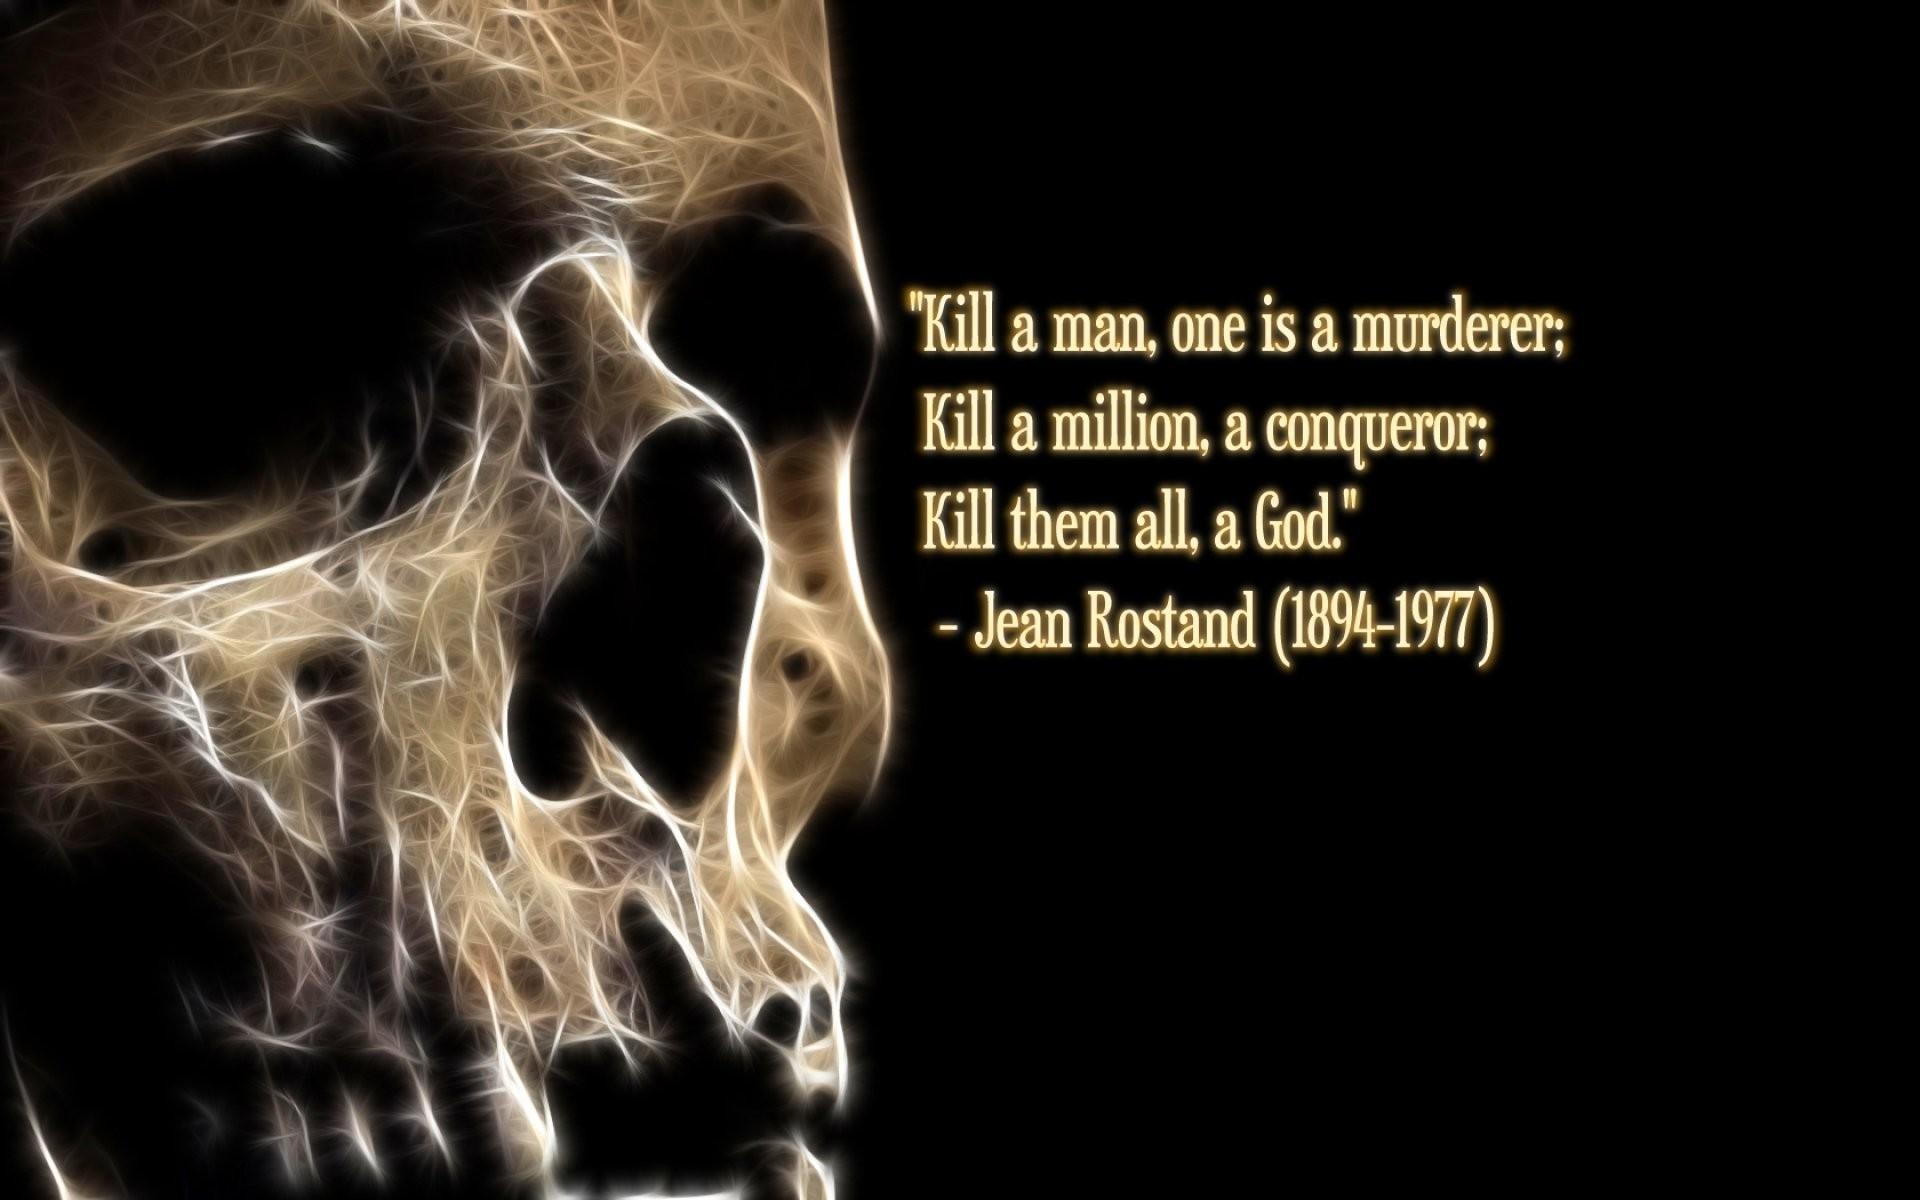 Dark, Evil, Horror, Artistic, Art, Hd Horror Wallpapers, - Skull Wallpaper With Quotes - HD Wallpaper